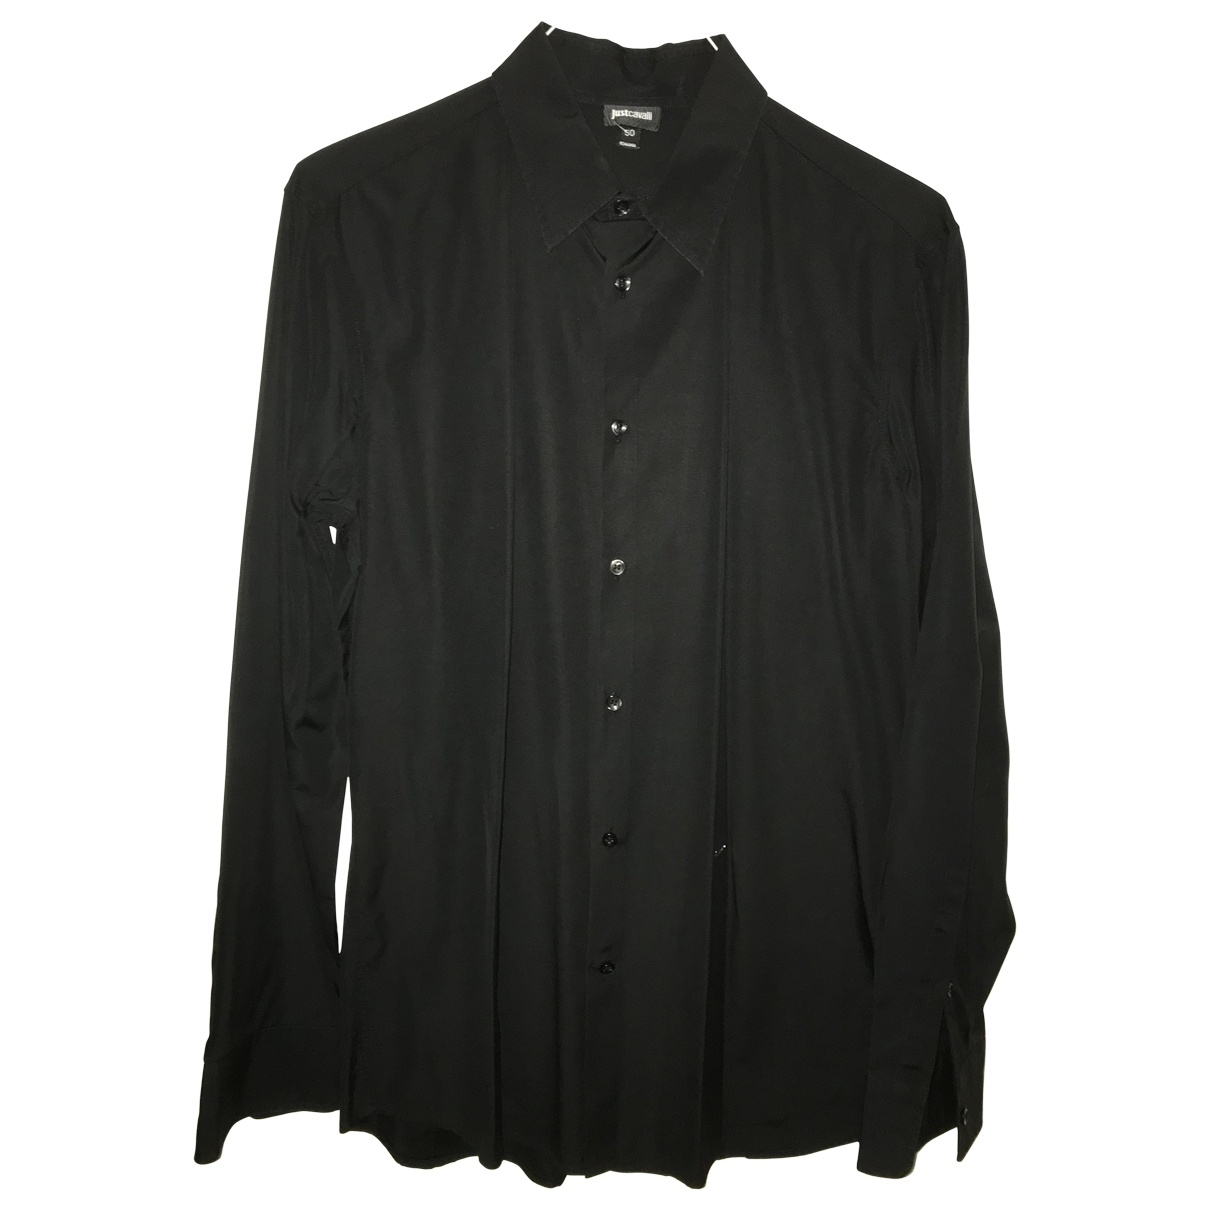 Just Cavalli \N Black Cotton Shirts for Men L International